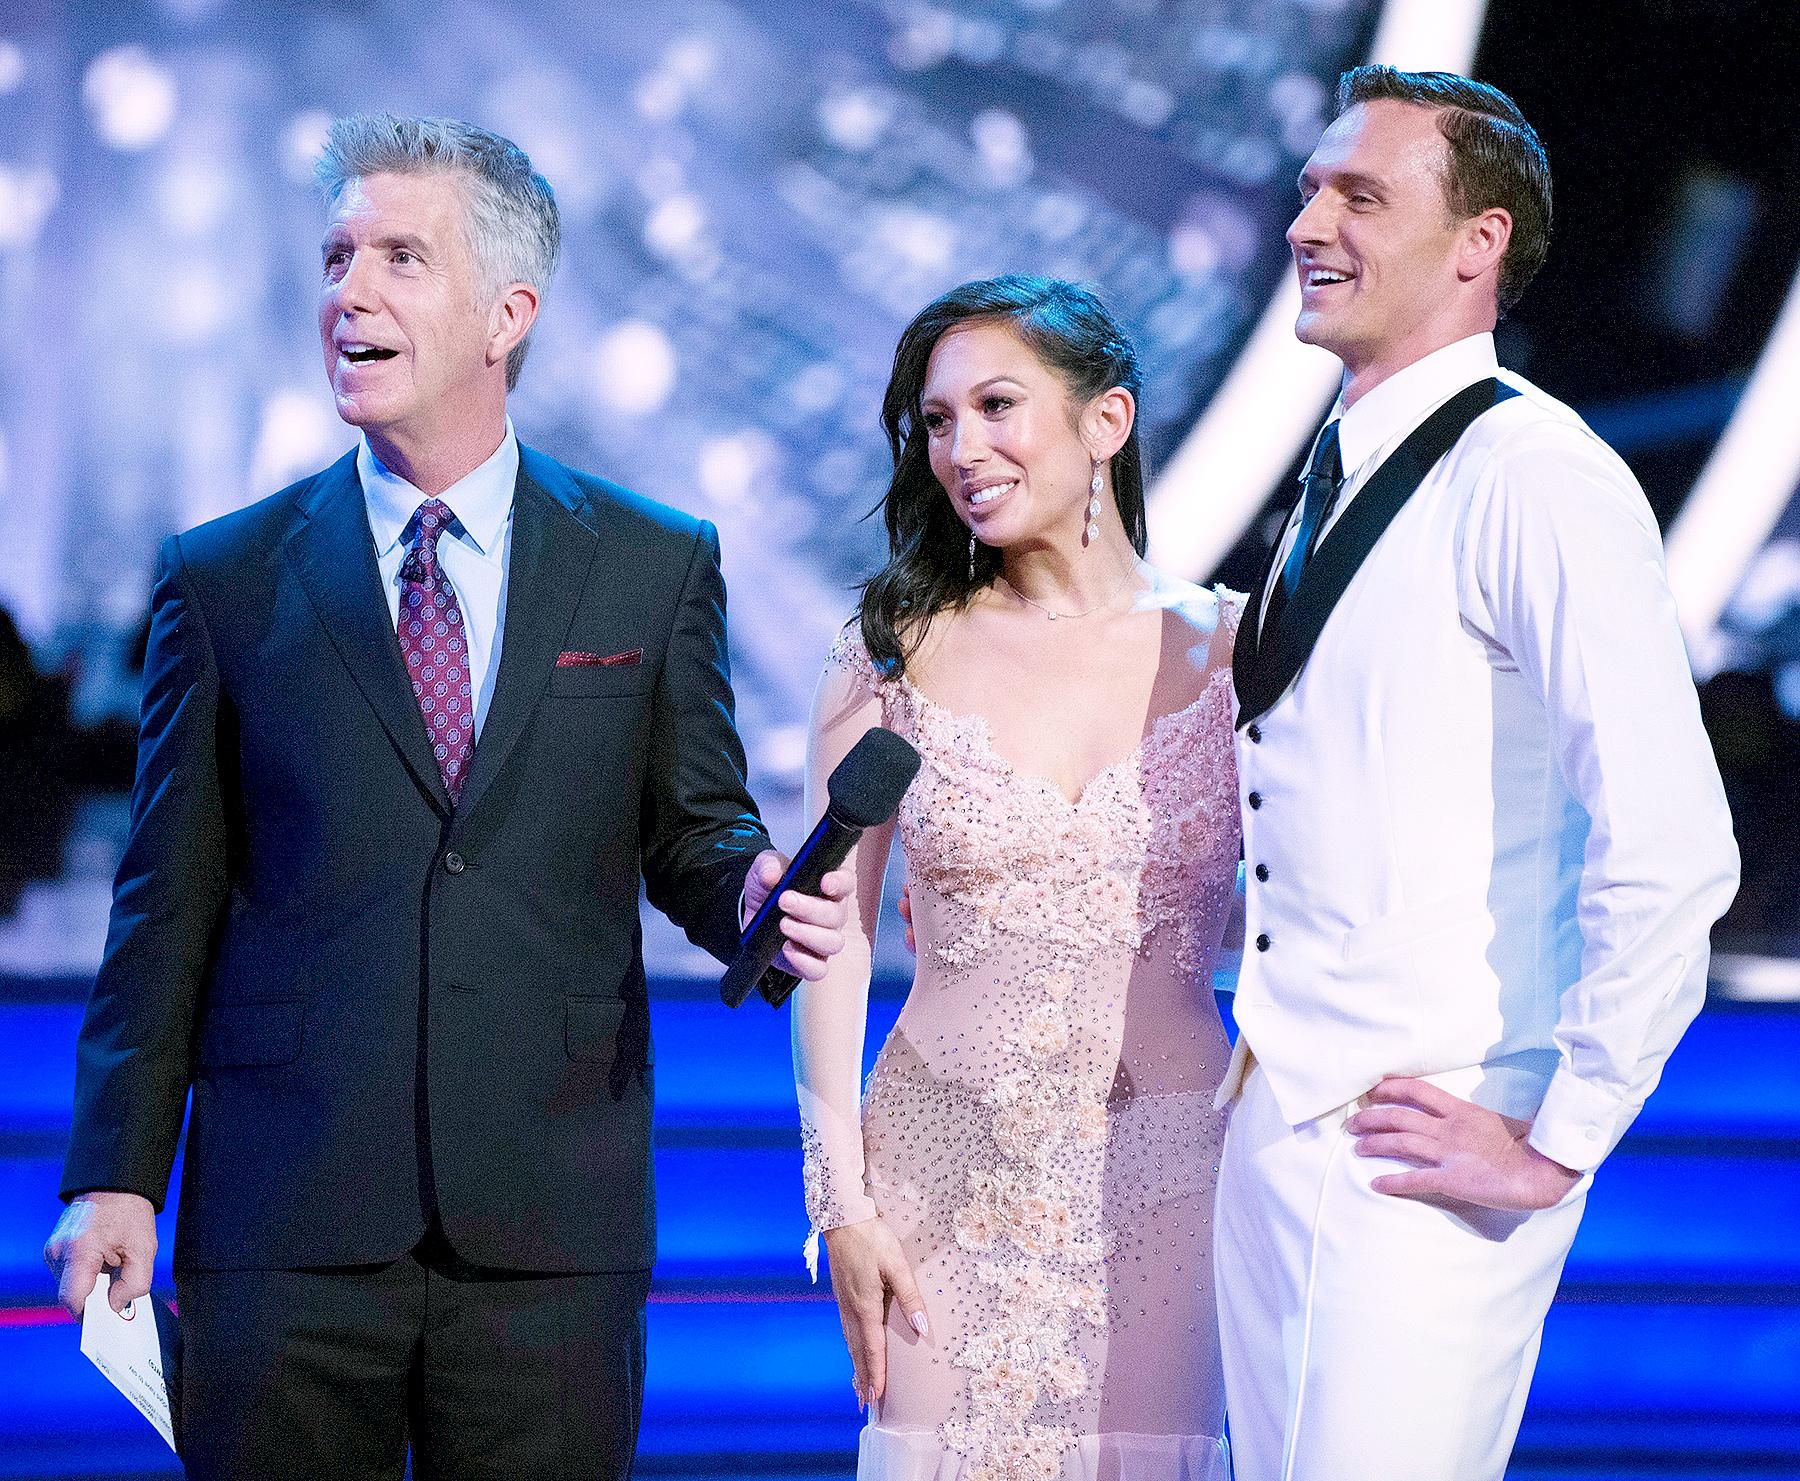 Tom Bergeron, Cheryl Burke, and Ryan Lochte